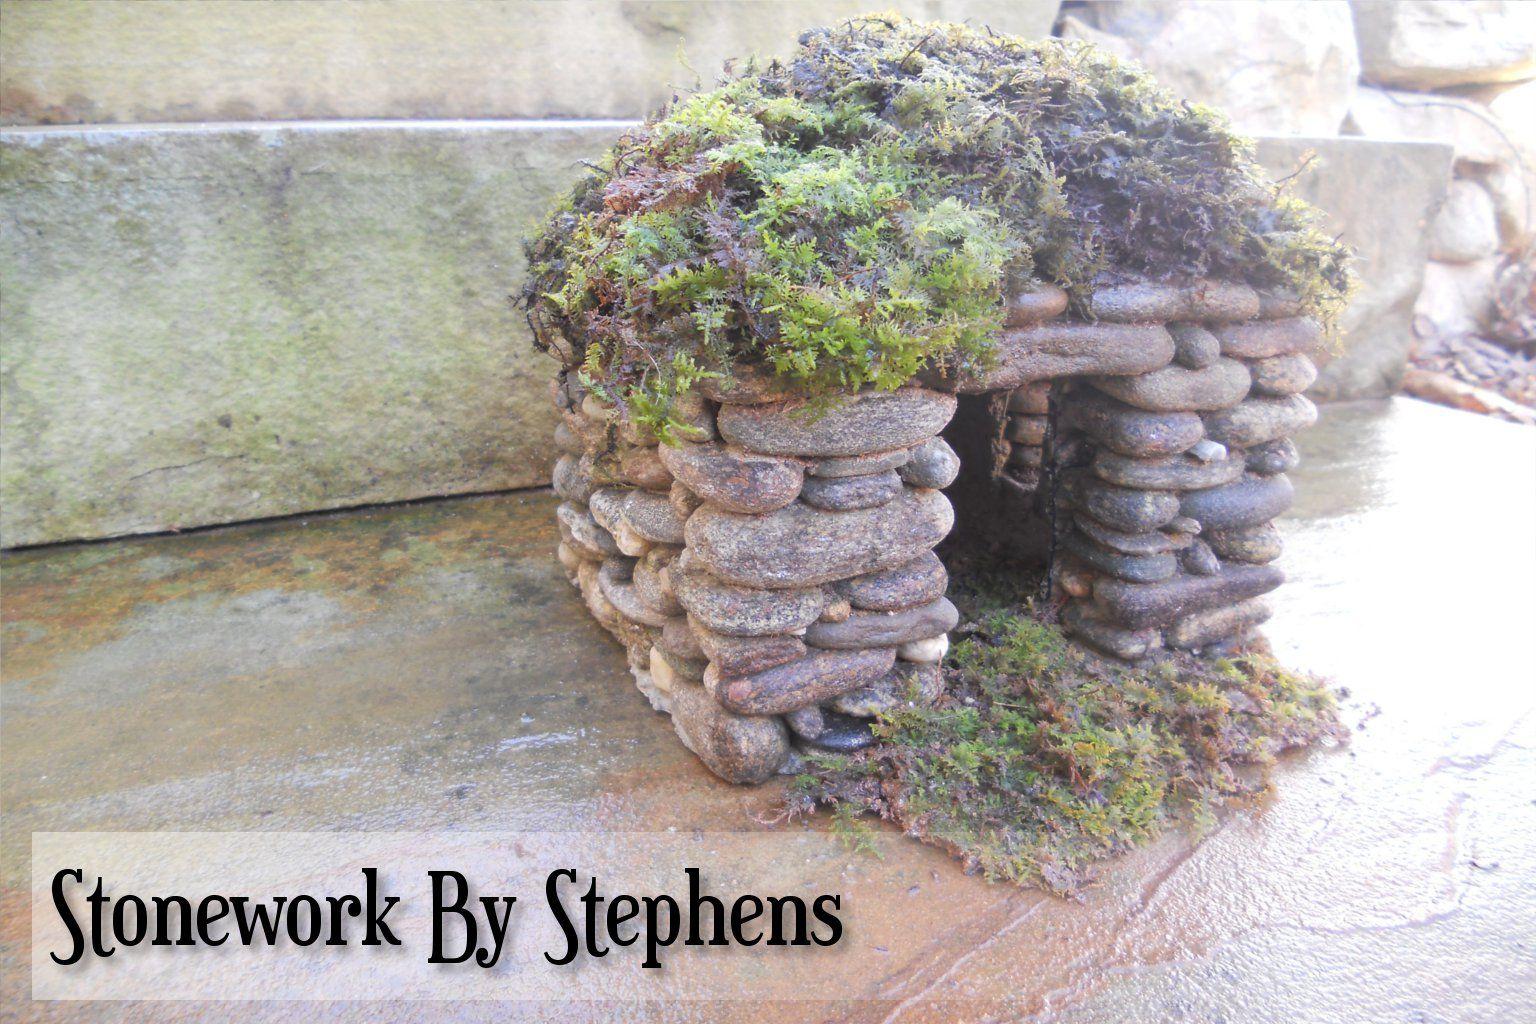 Moss Roofs 002w Jpg 1 536 1 024 Pixels Miniature Fairy Gardens Fairy Furniture Fairy Garden Houses